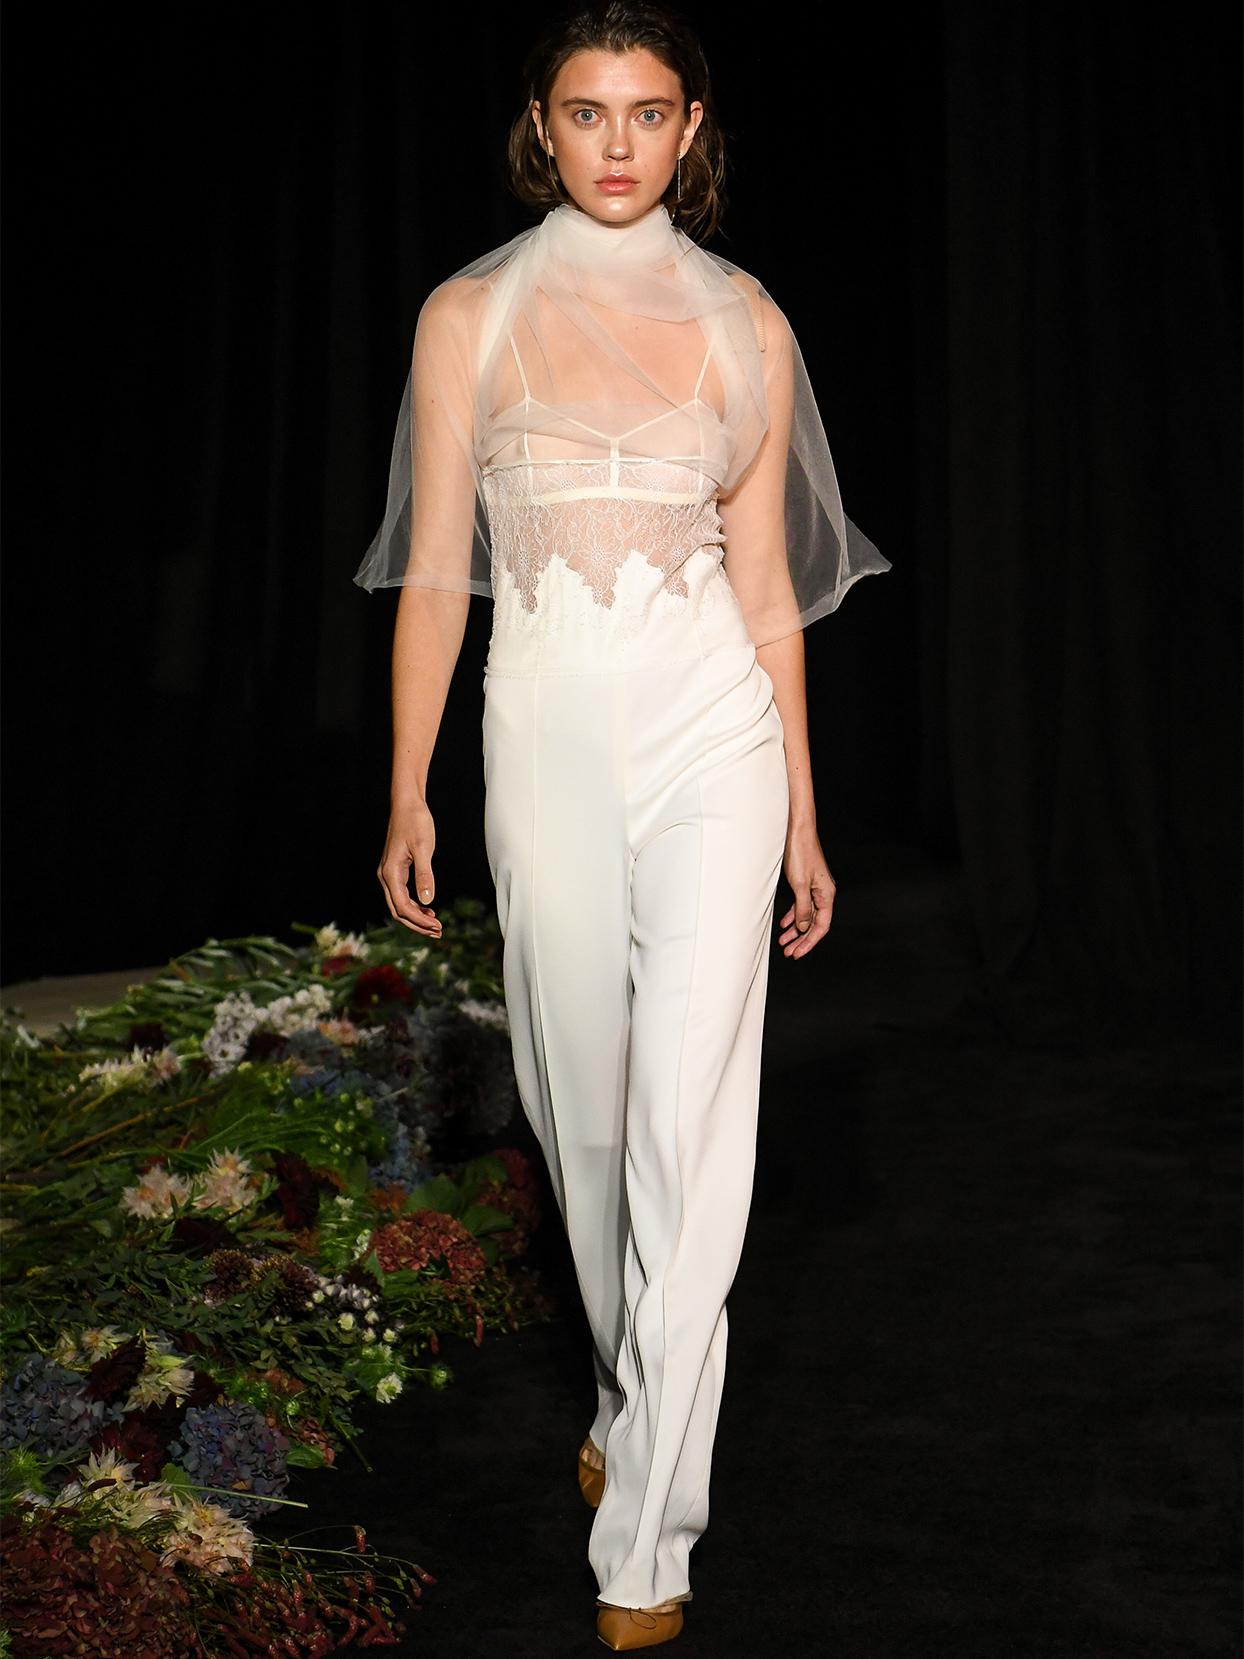 danielle frankel sheer bodice pants suit wedding dress fall 2020